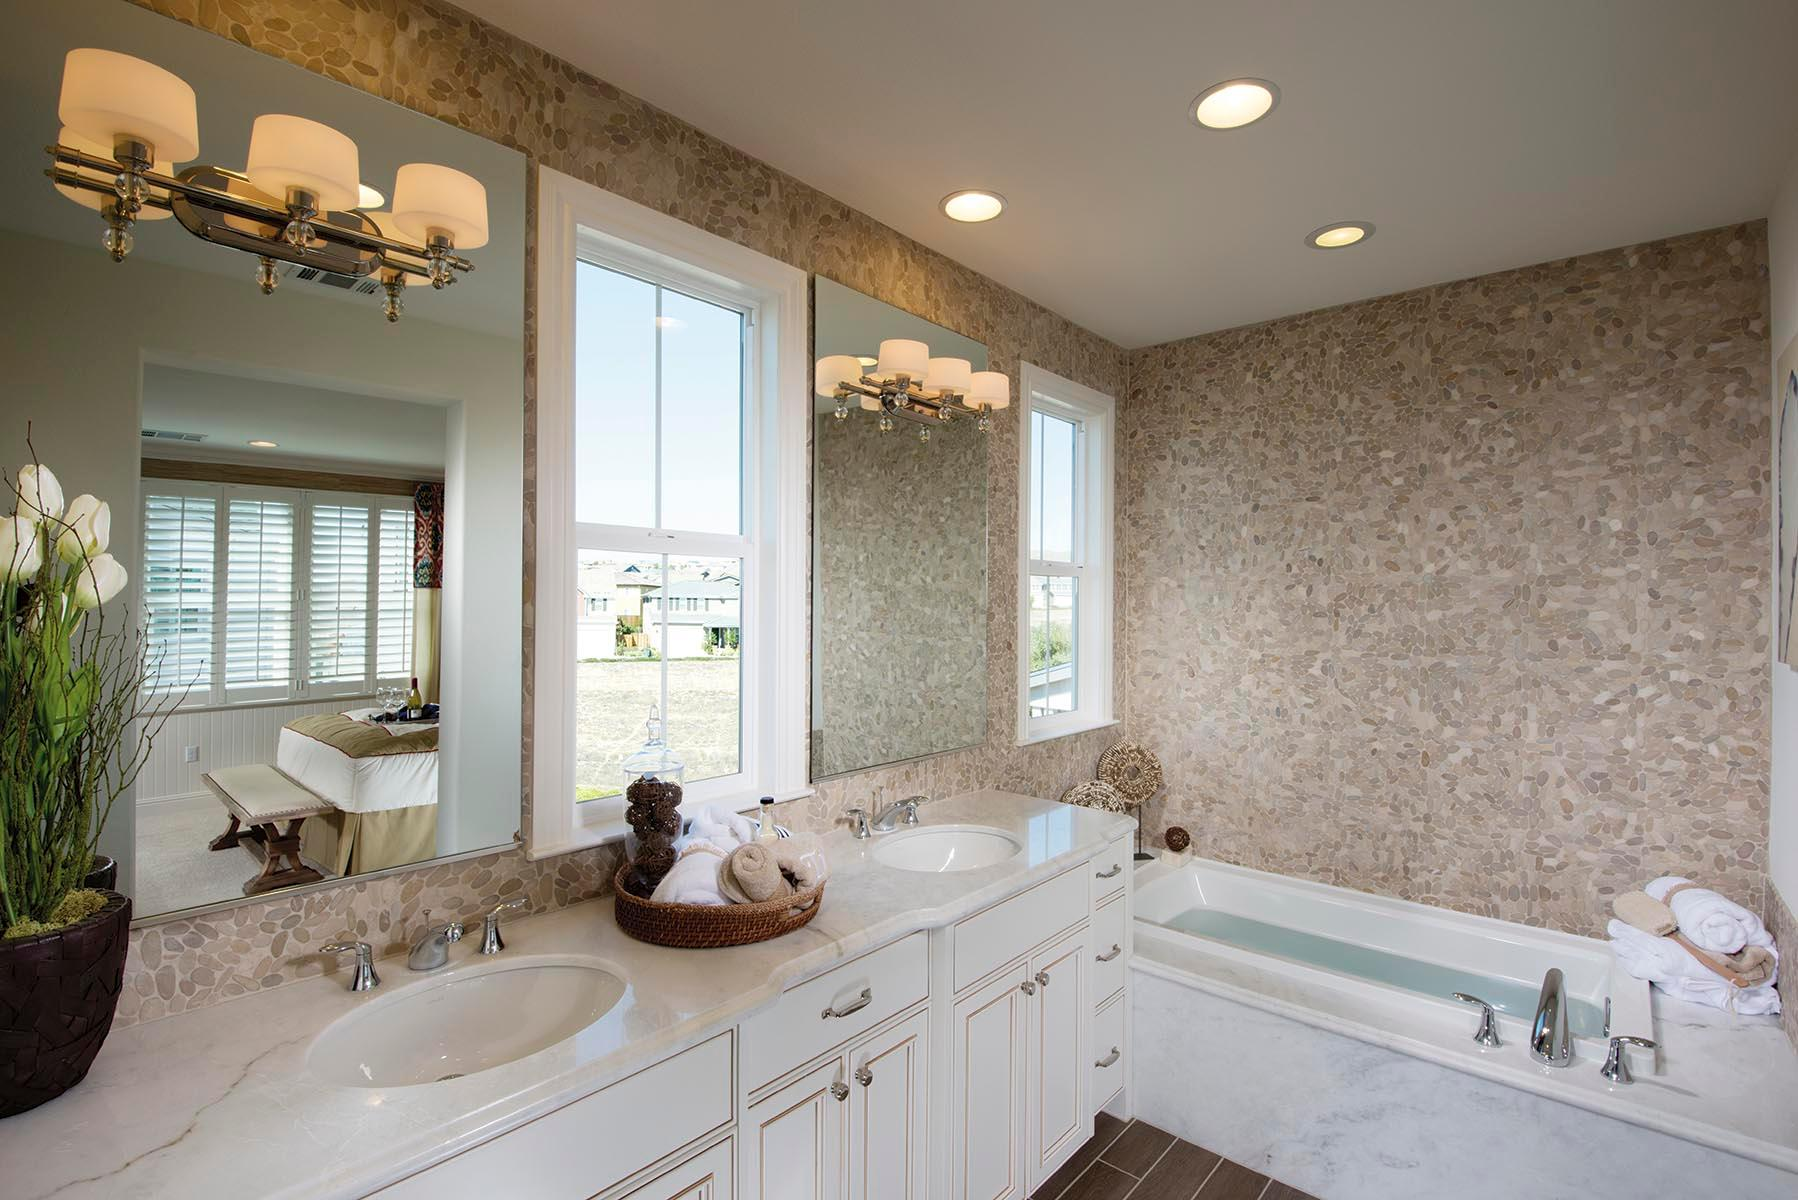 Hampton Bay Dakota Collection 3 Light Bathroom Vanity: Progress Lighting P2927-104WB Fortune Collection 3-Light